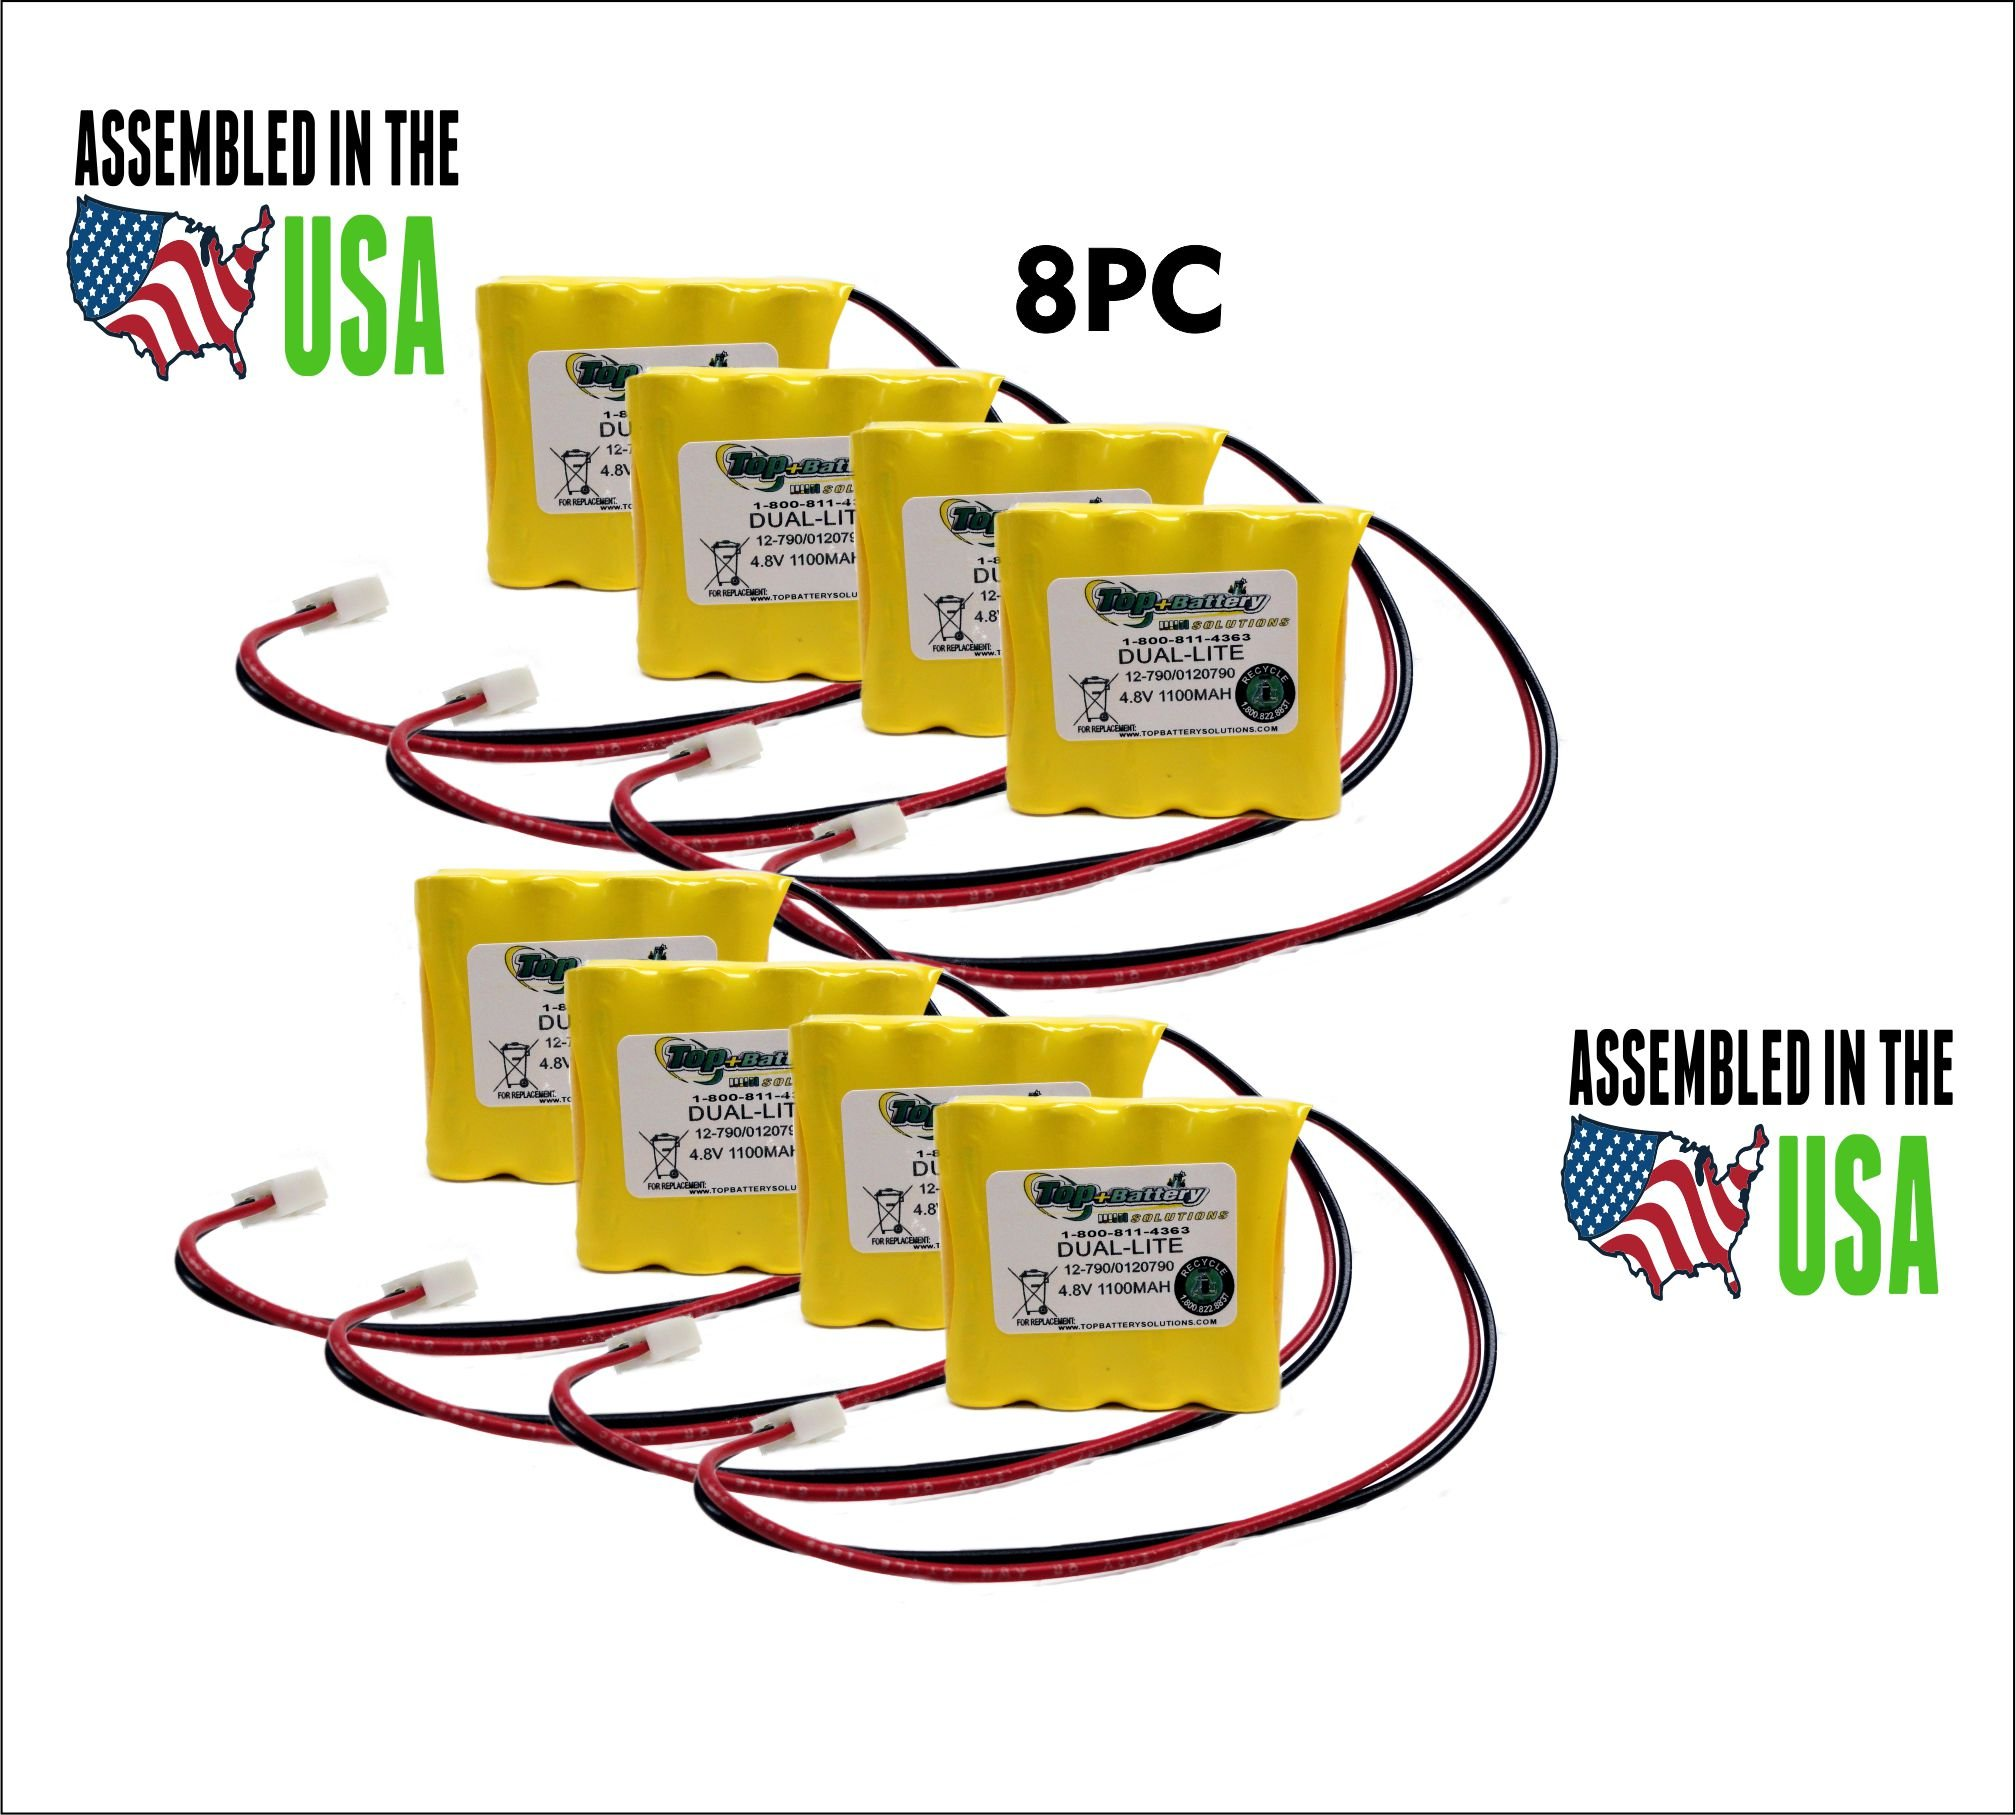 8PC DualLite 12-790, 0120790, 0120790 REV. A, 0120790 REV. B